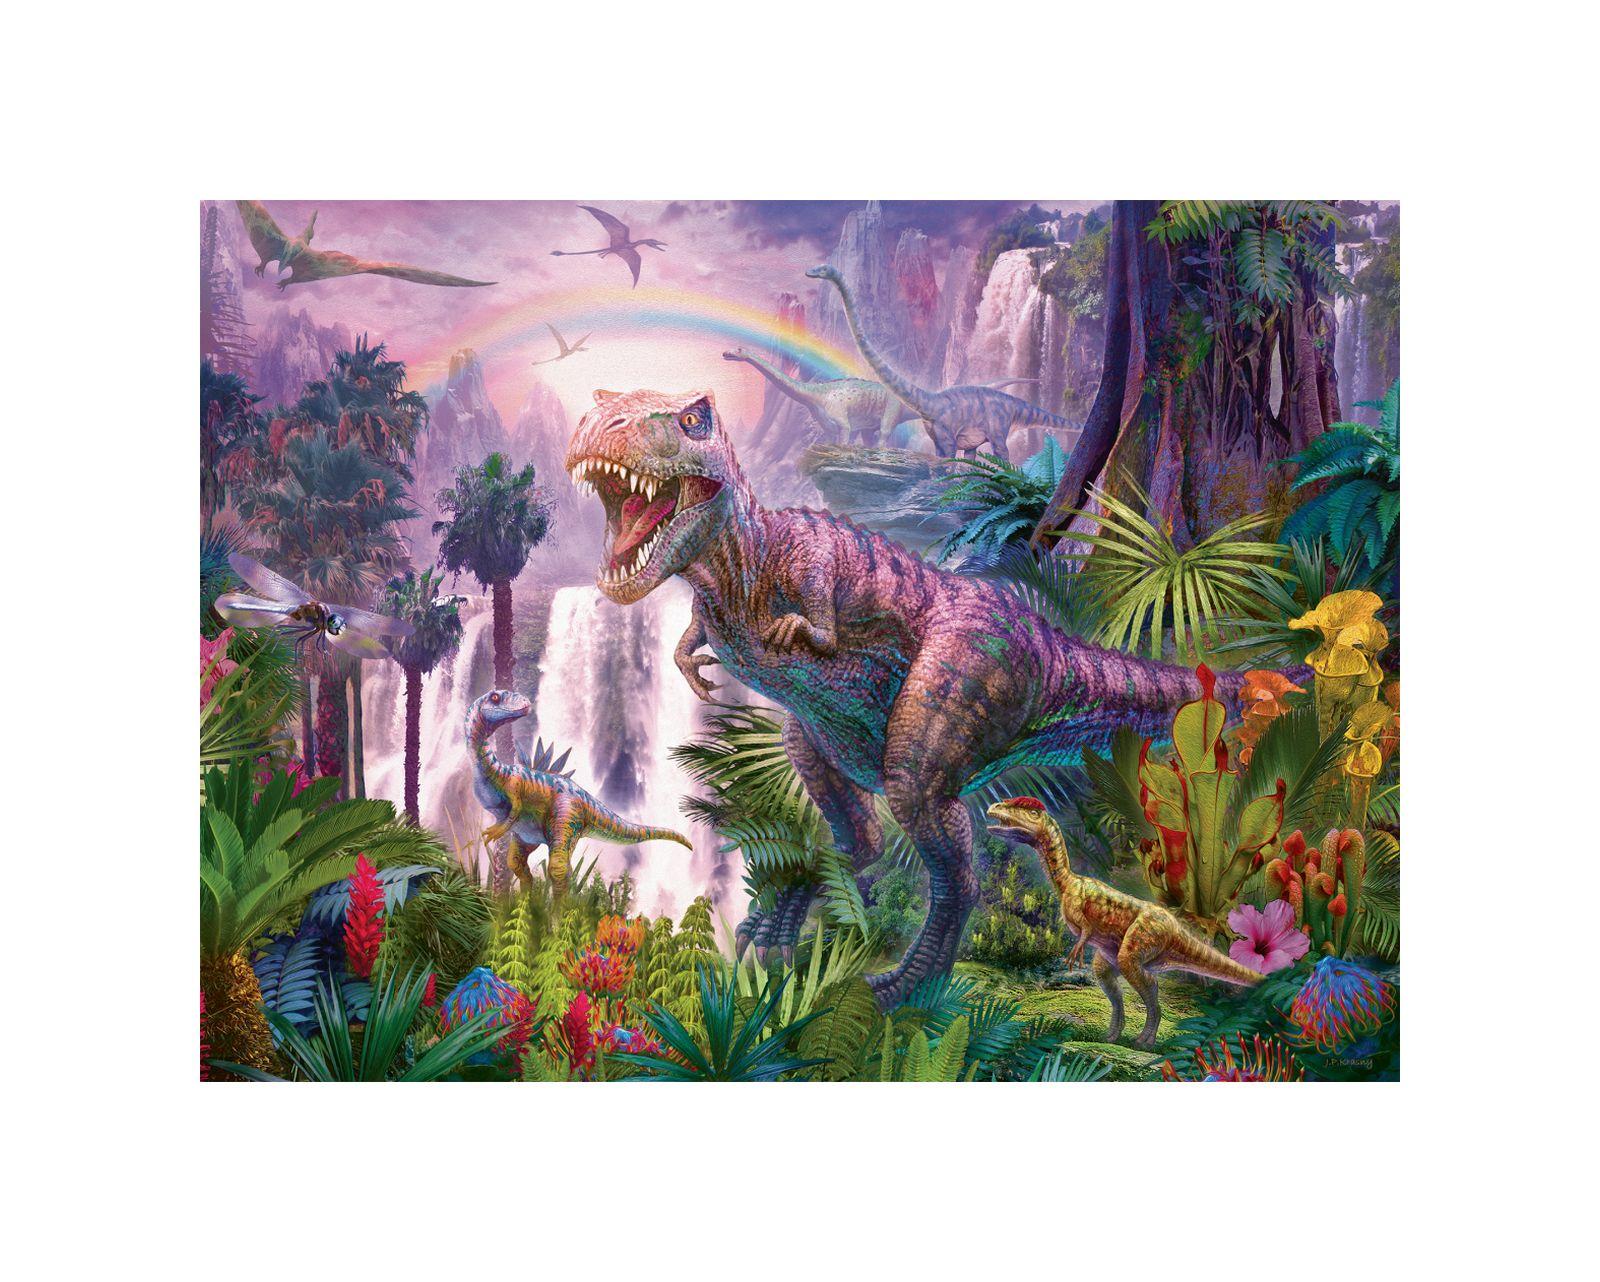 Ravensburger - puzzle 200 pezzi xxl - paese dei dinosauri - Ravensburger1